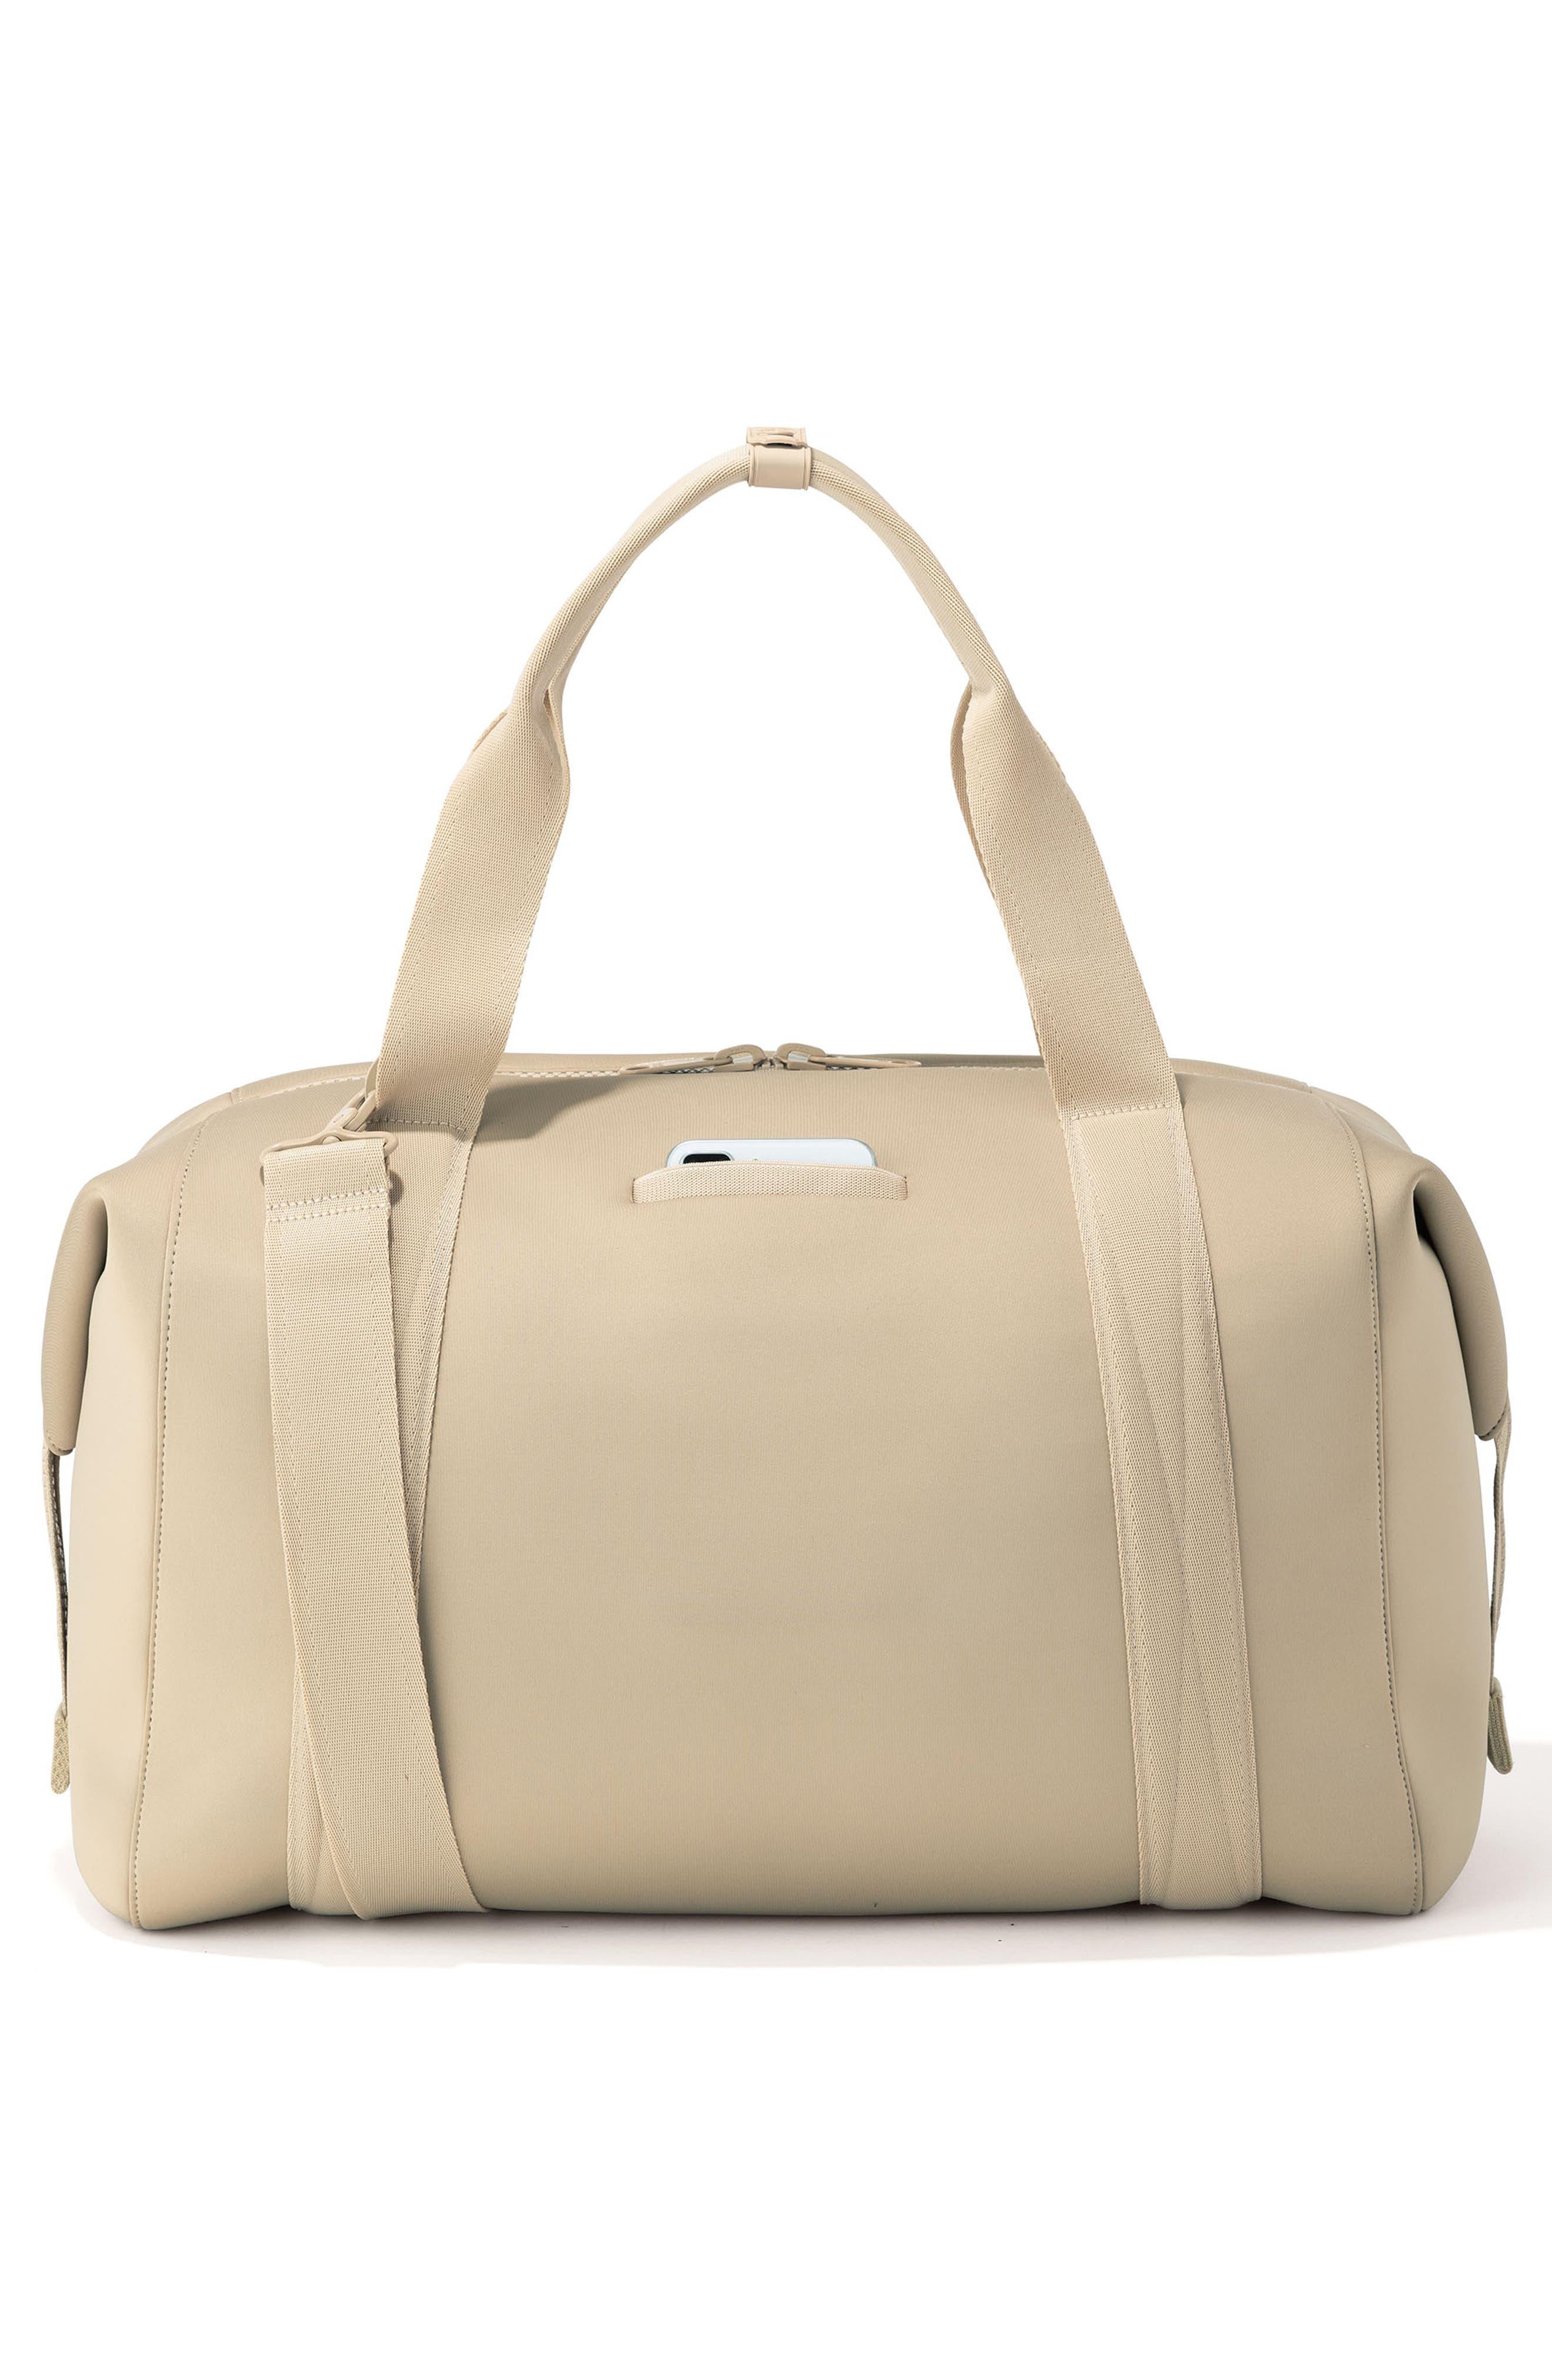 DAGNE DOVER, XL Landon Carryall Duffel Bag, Alternate thumbnail 2, color, ALMOND LATTE